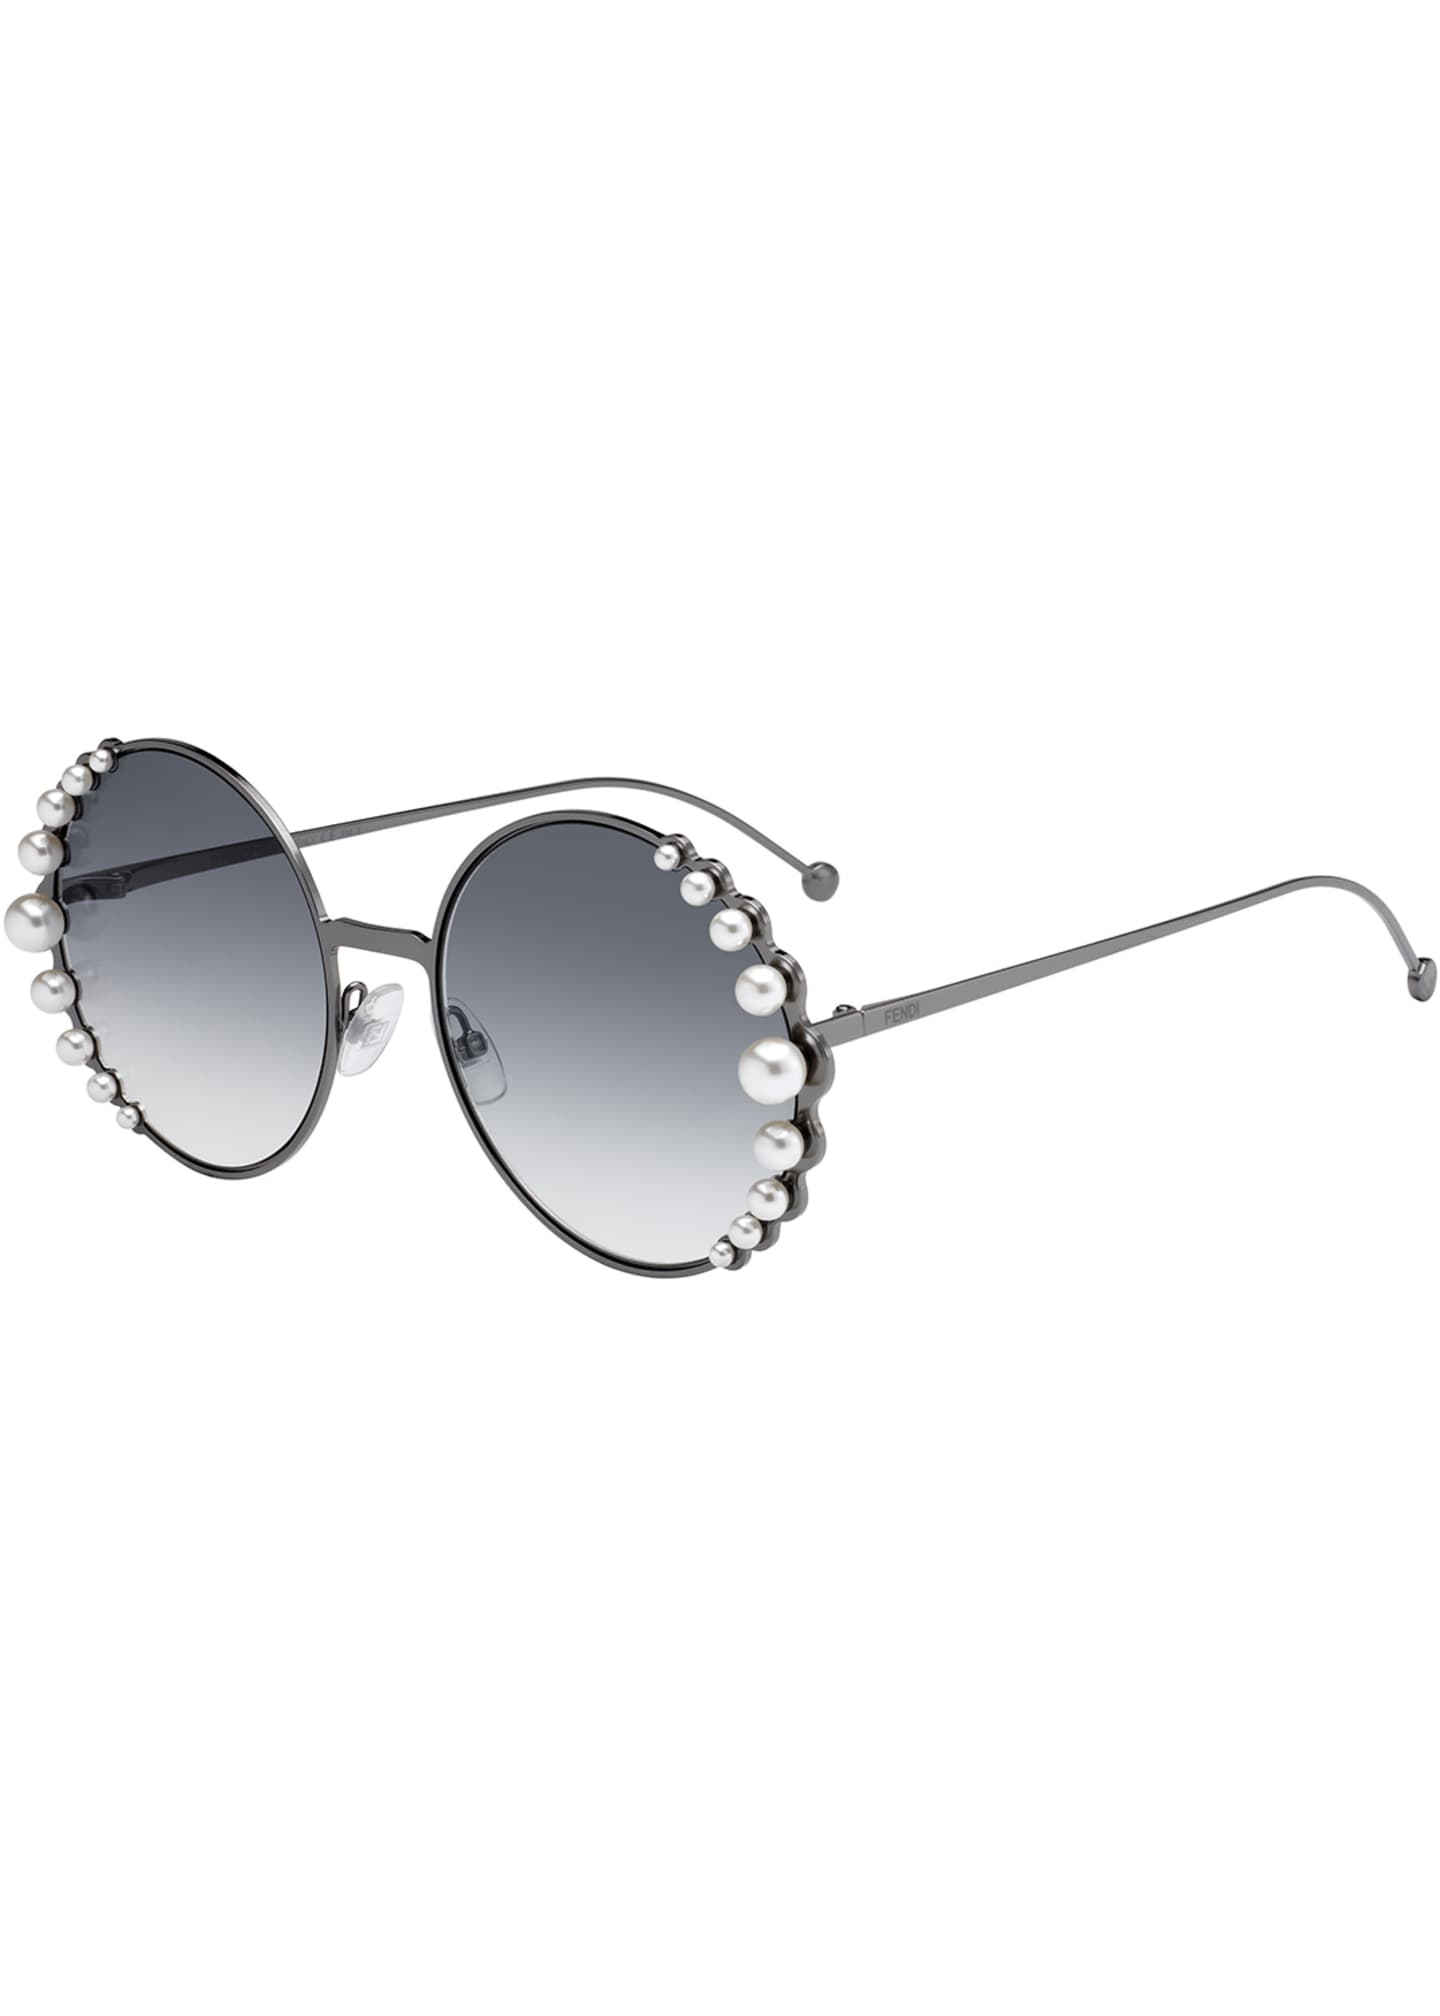 Fendi Round Metal Sunglasses w/ Pearly Trim